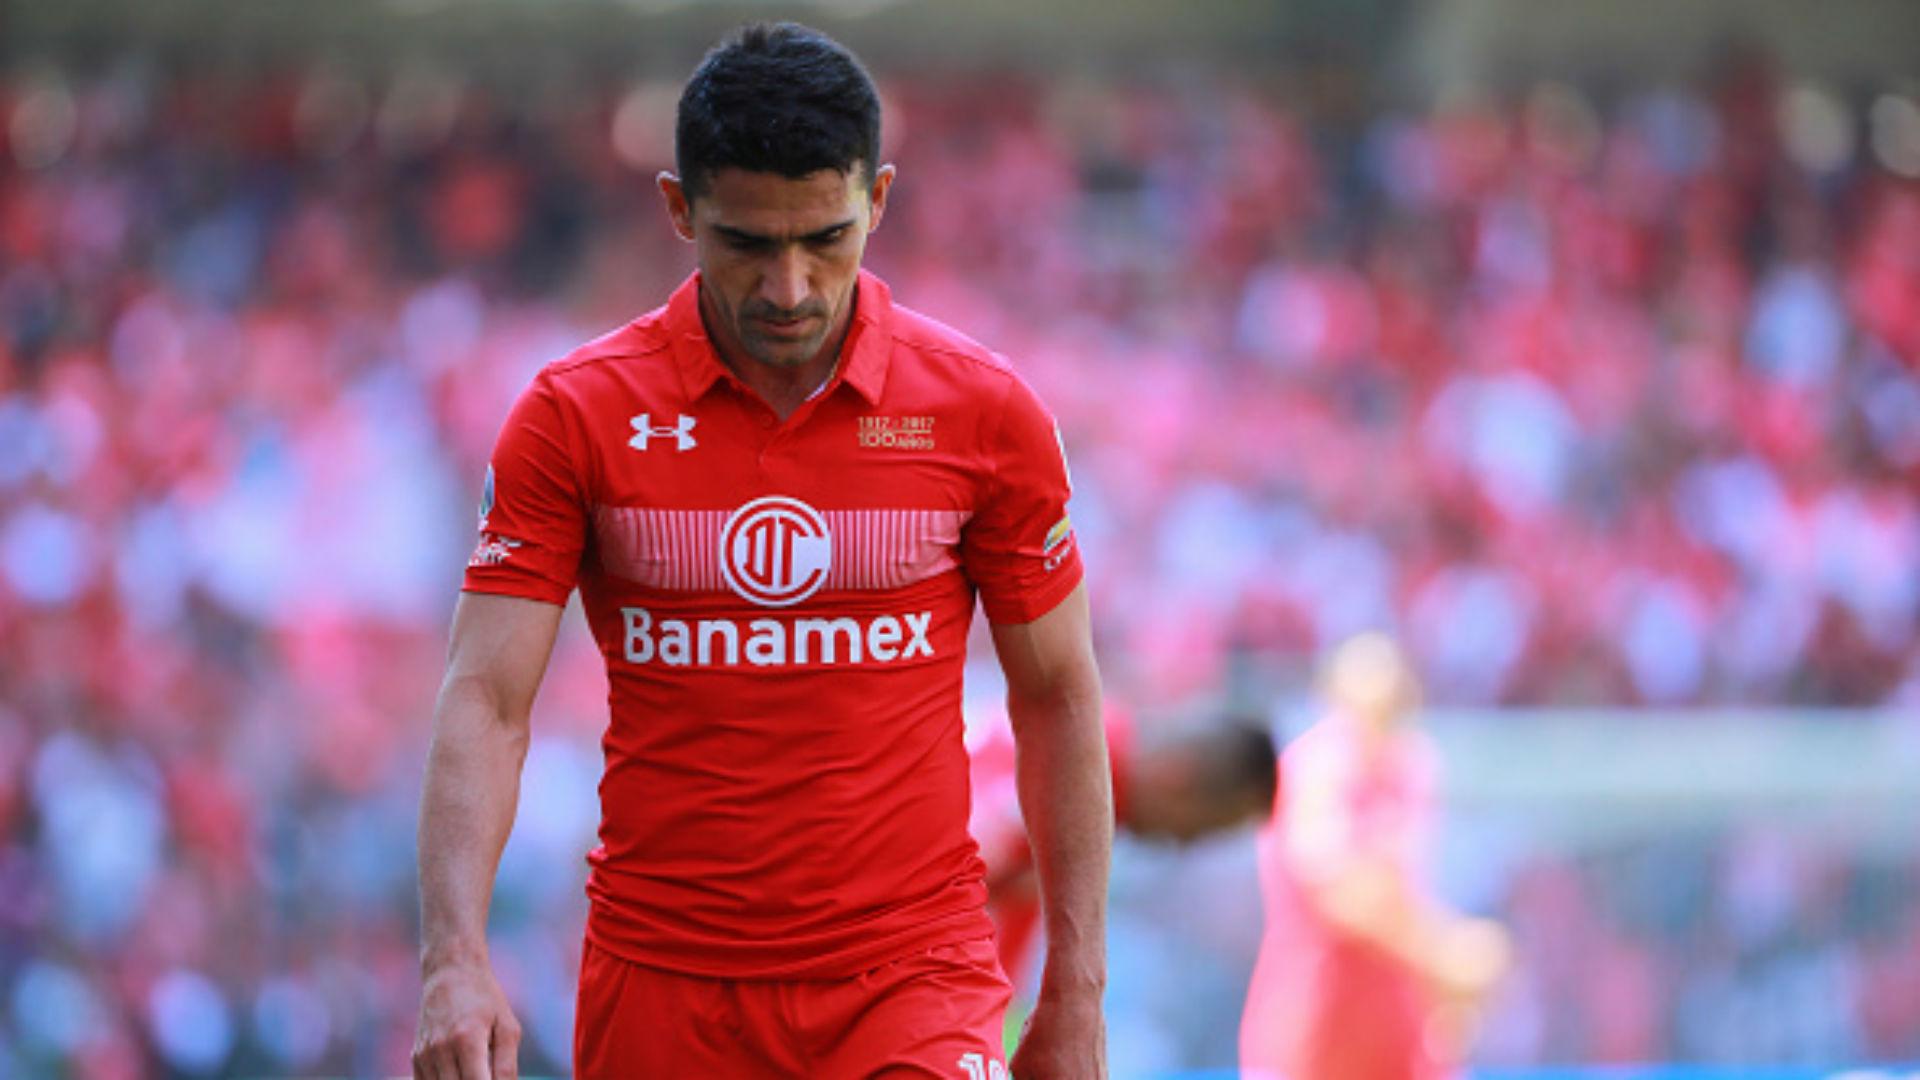 Liga MX Mexico Clausura 2017 Antonio Naelson Sinha Toluca